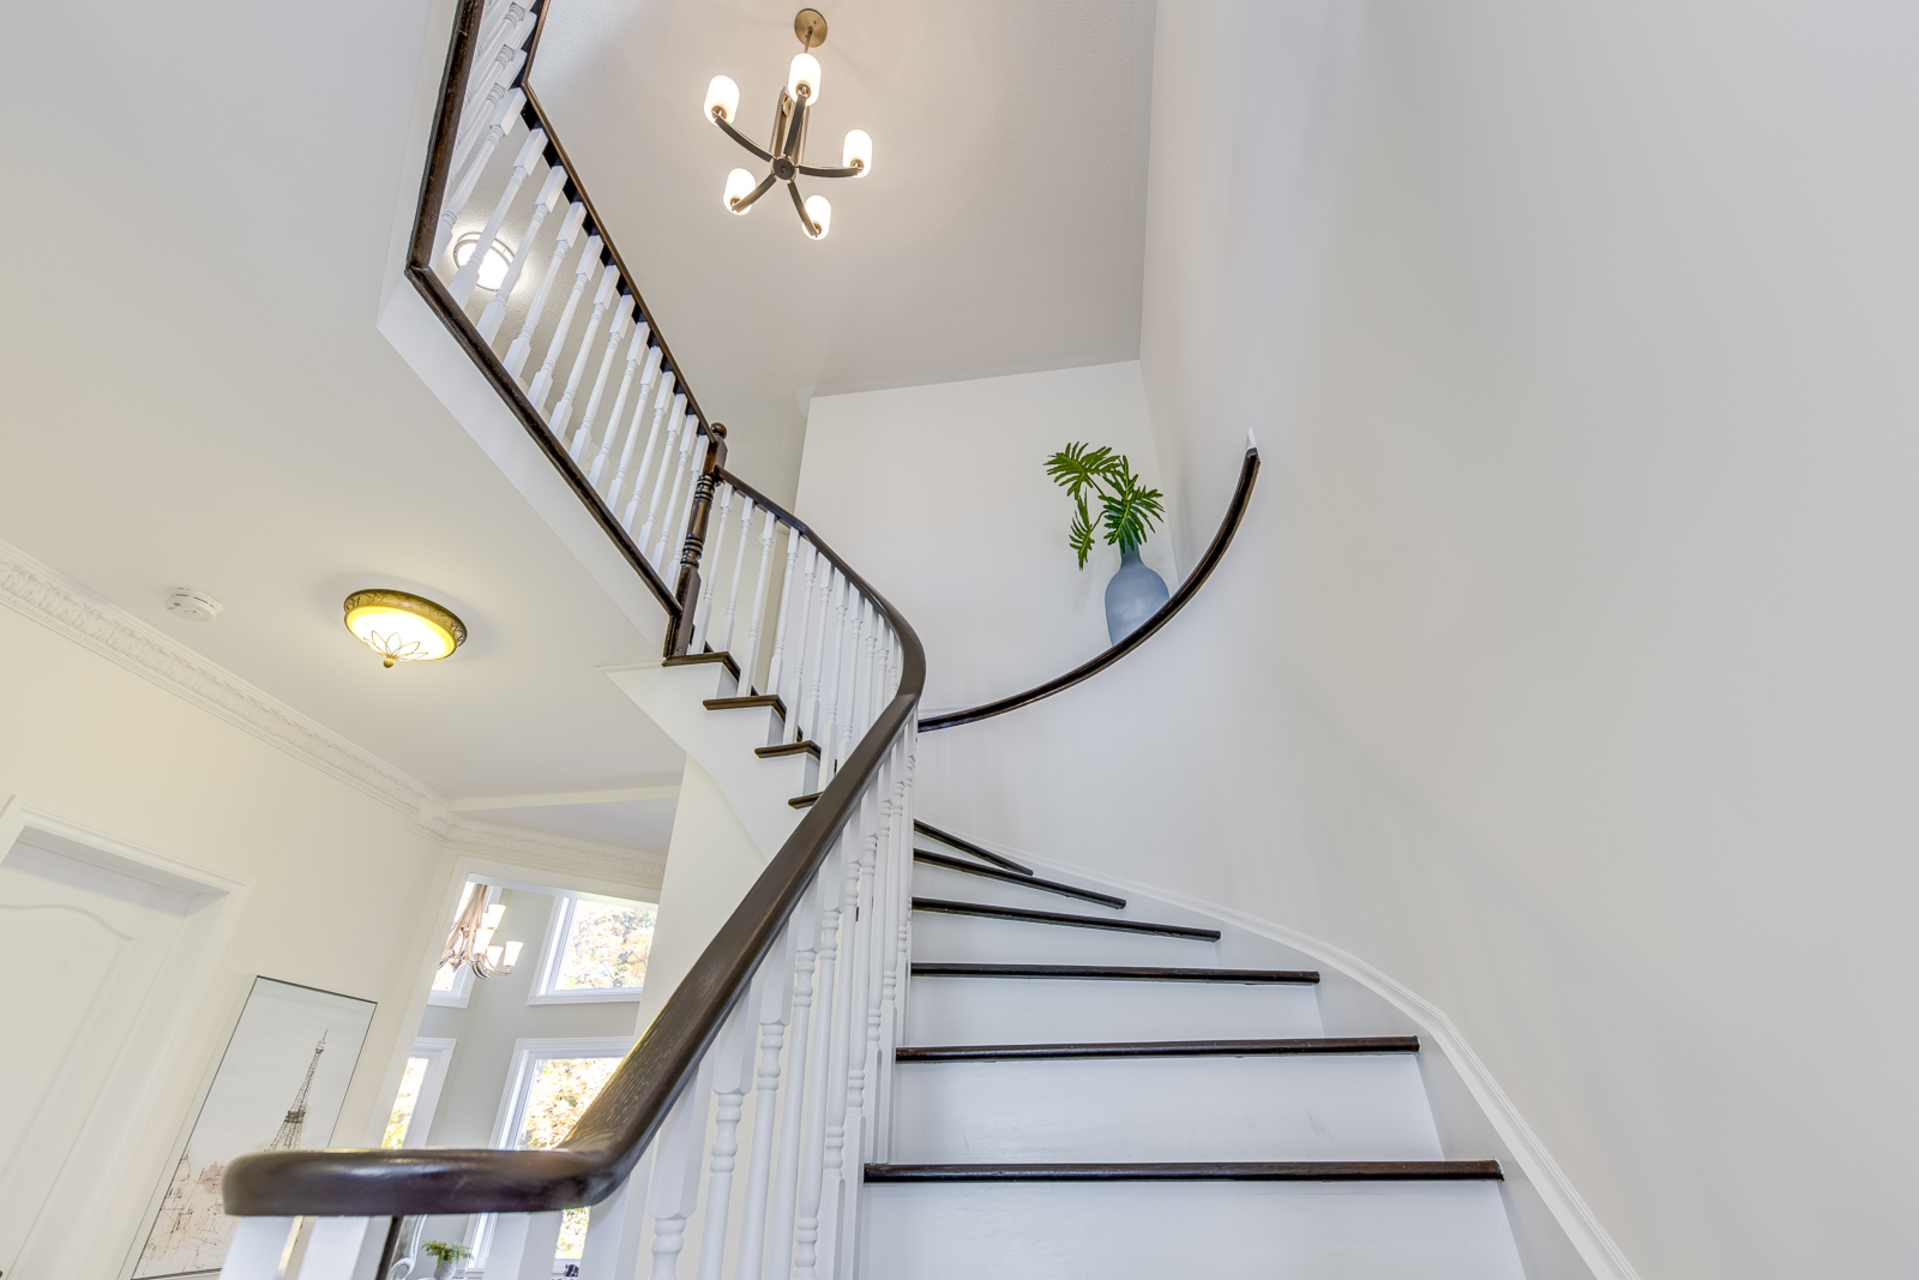 Stairs - 1806 Glenvista Dr, Oakville - Elite3 & Team at  Glenvista Drive, Iroquois Ridge North, Oakville